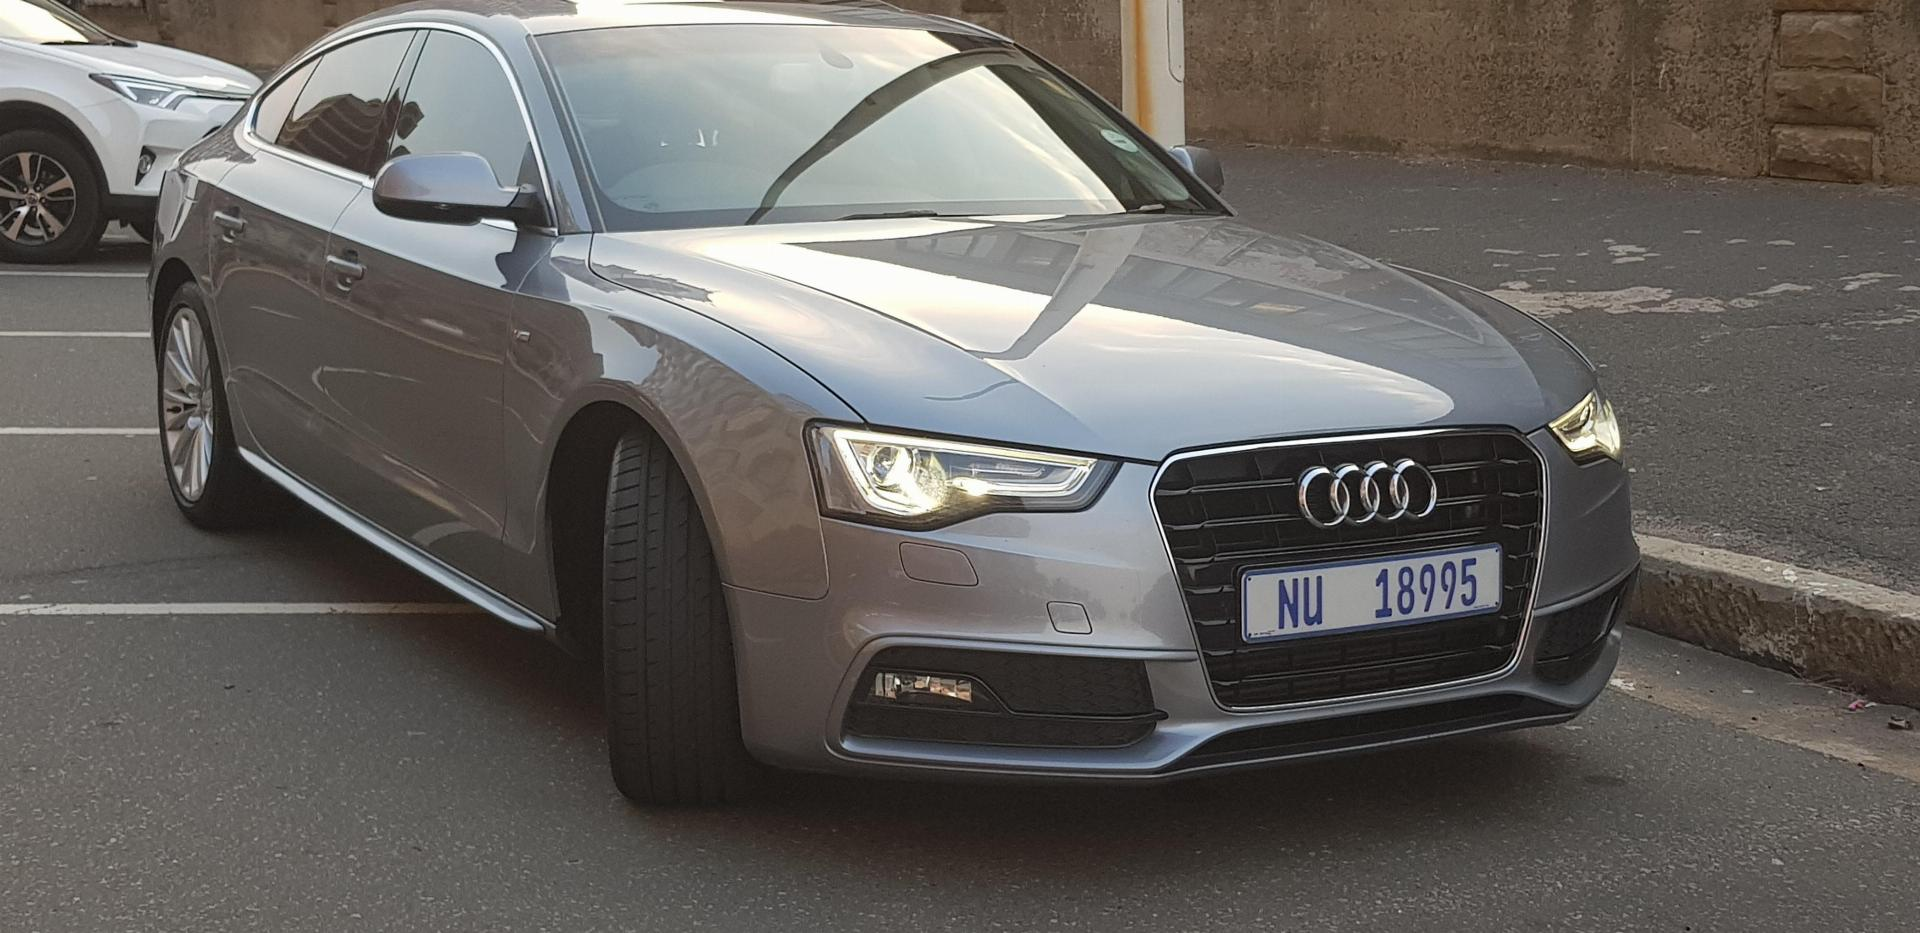 A5 Audi 2.0 TDI Spoartback